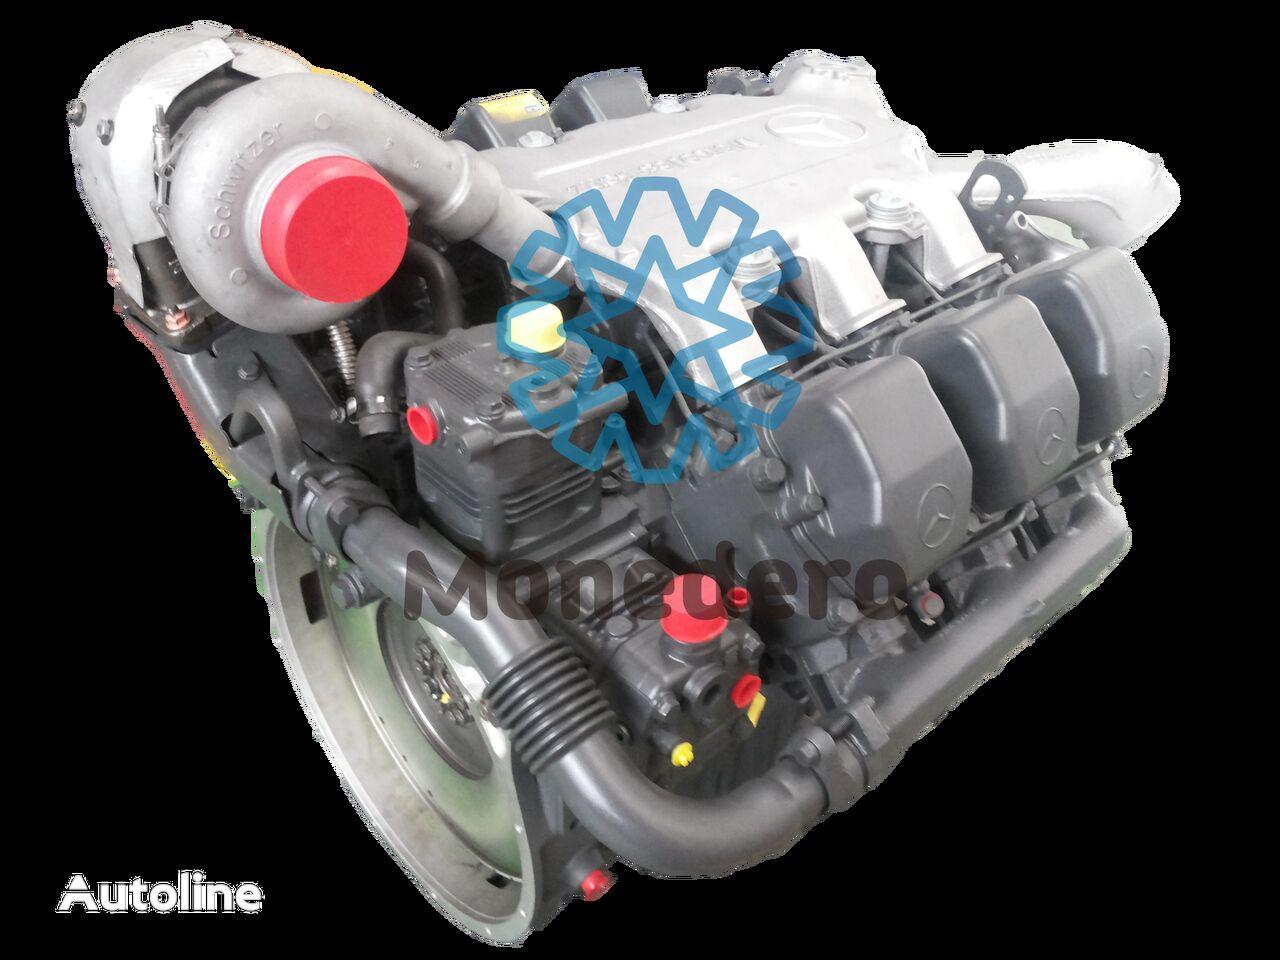 Mercedes Benz OM 501 LA engine for truck